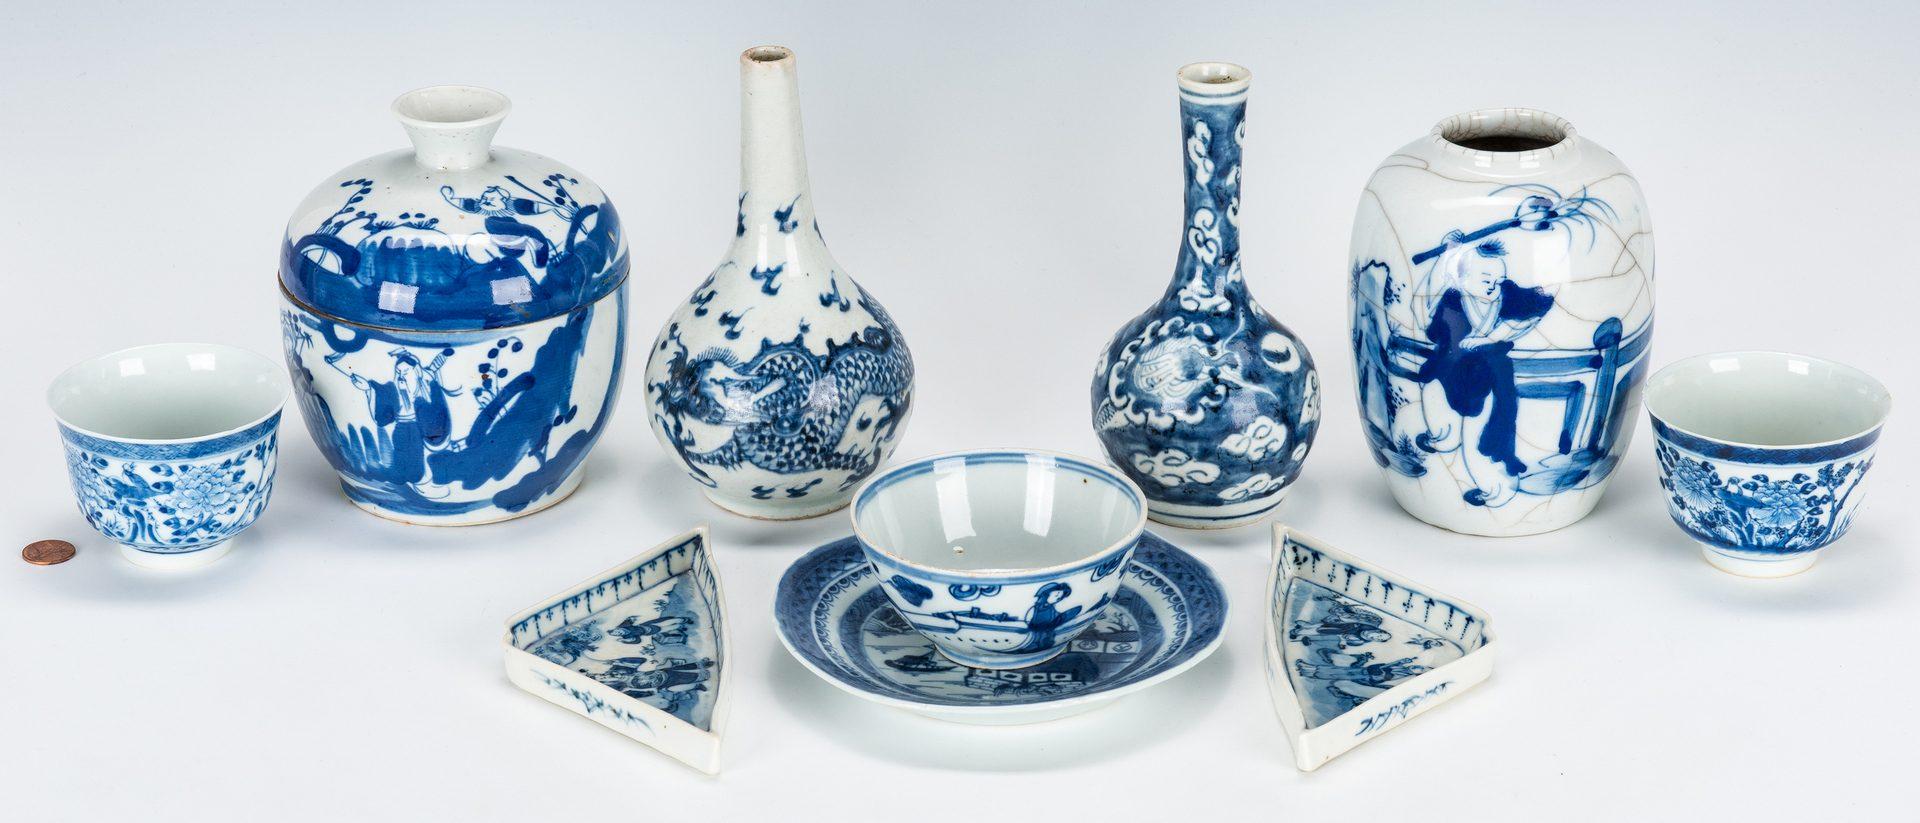 Lot 475: 10 Pcs. Chinese Export Blue & White Porcelain